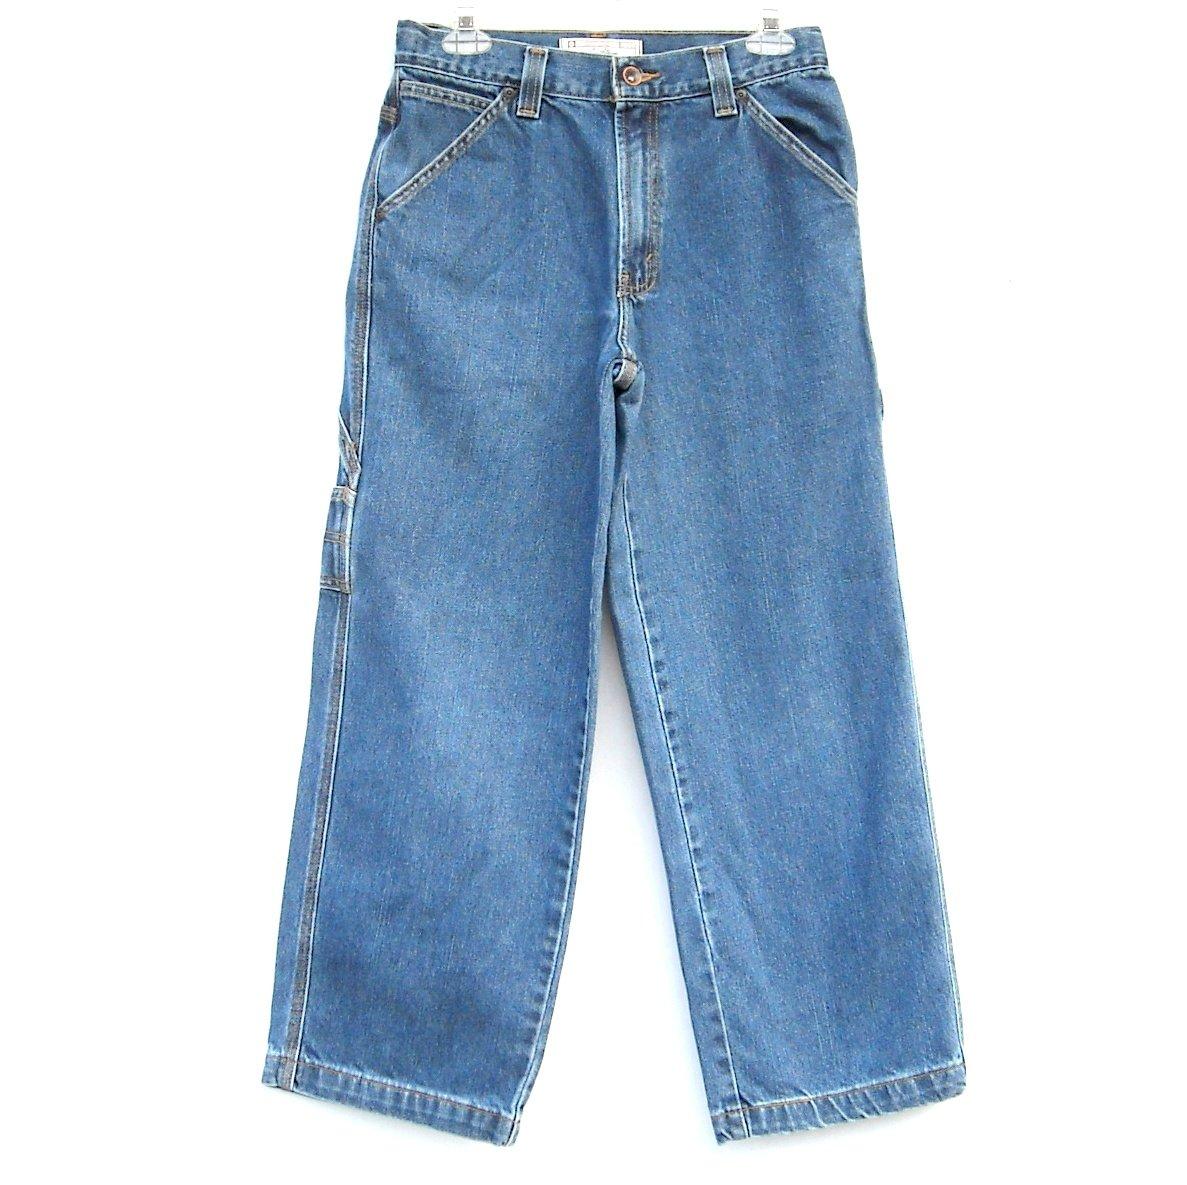 Levi Strauss Signature Blue Jeans Size 16